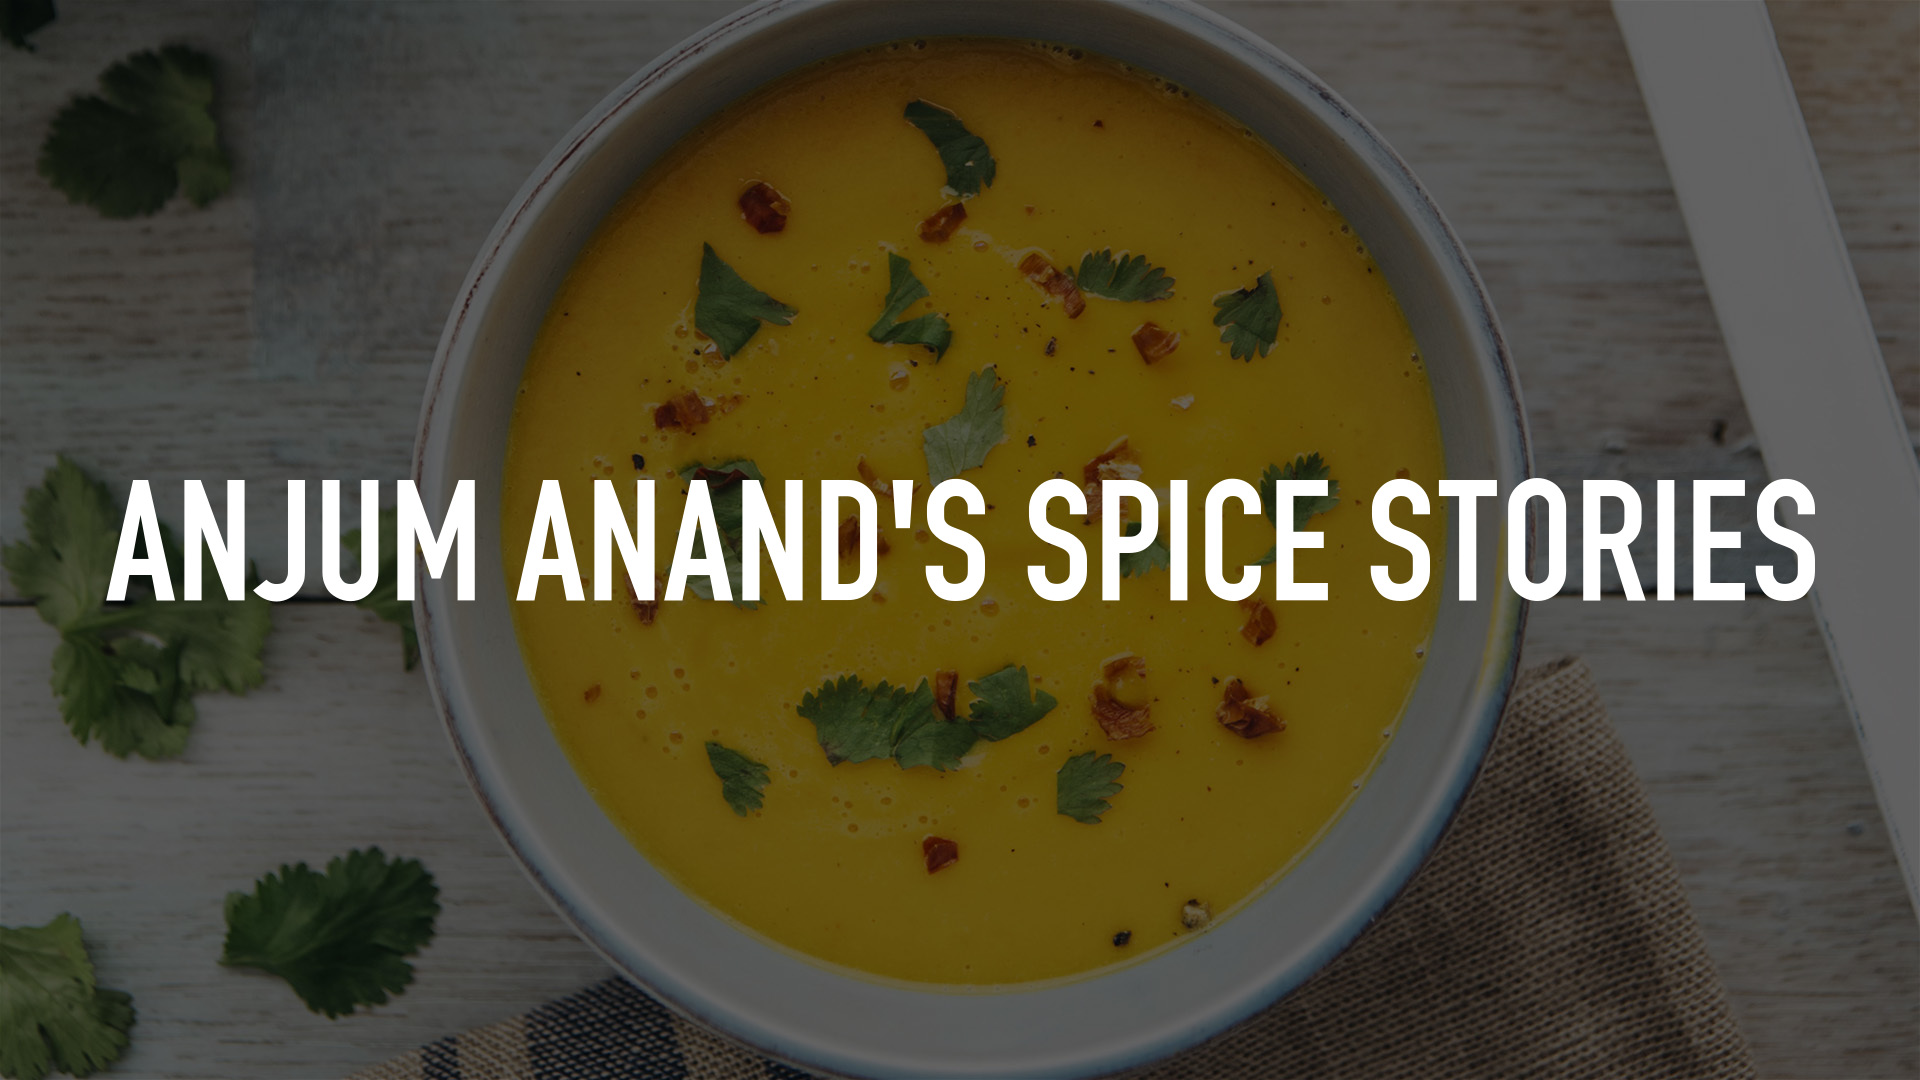 Anjum's Spice Stories